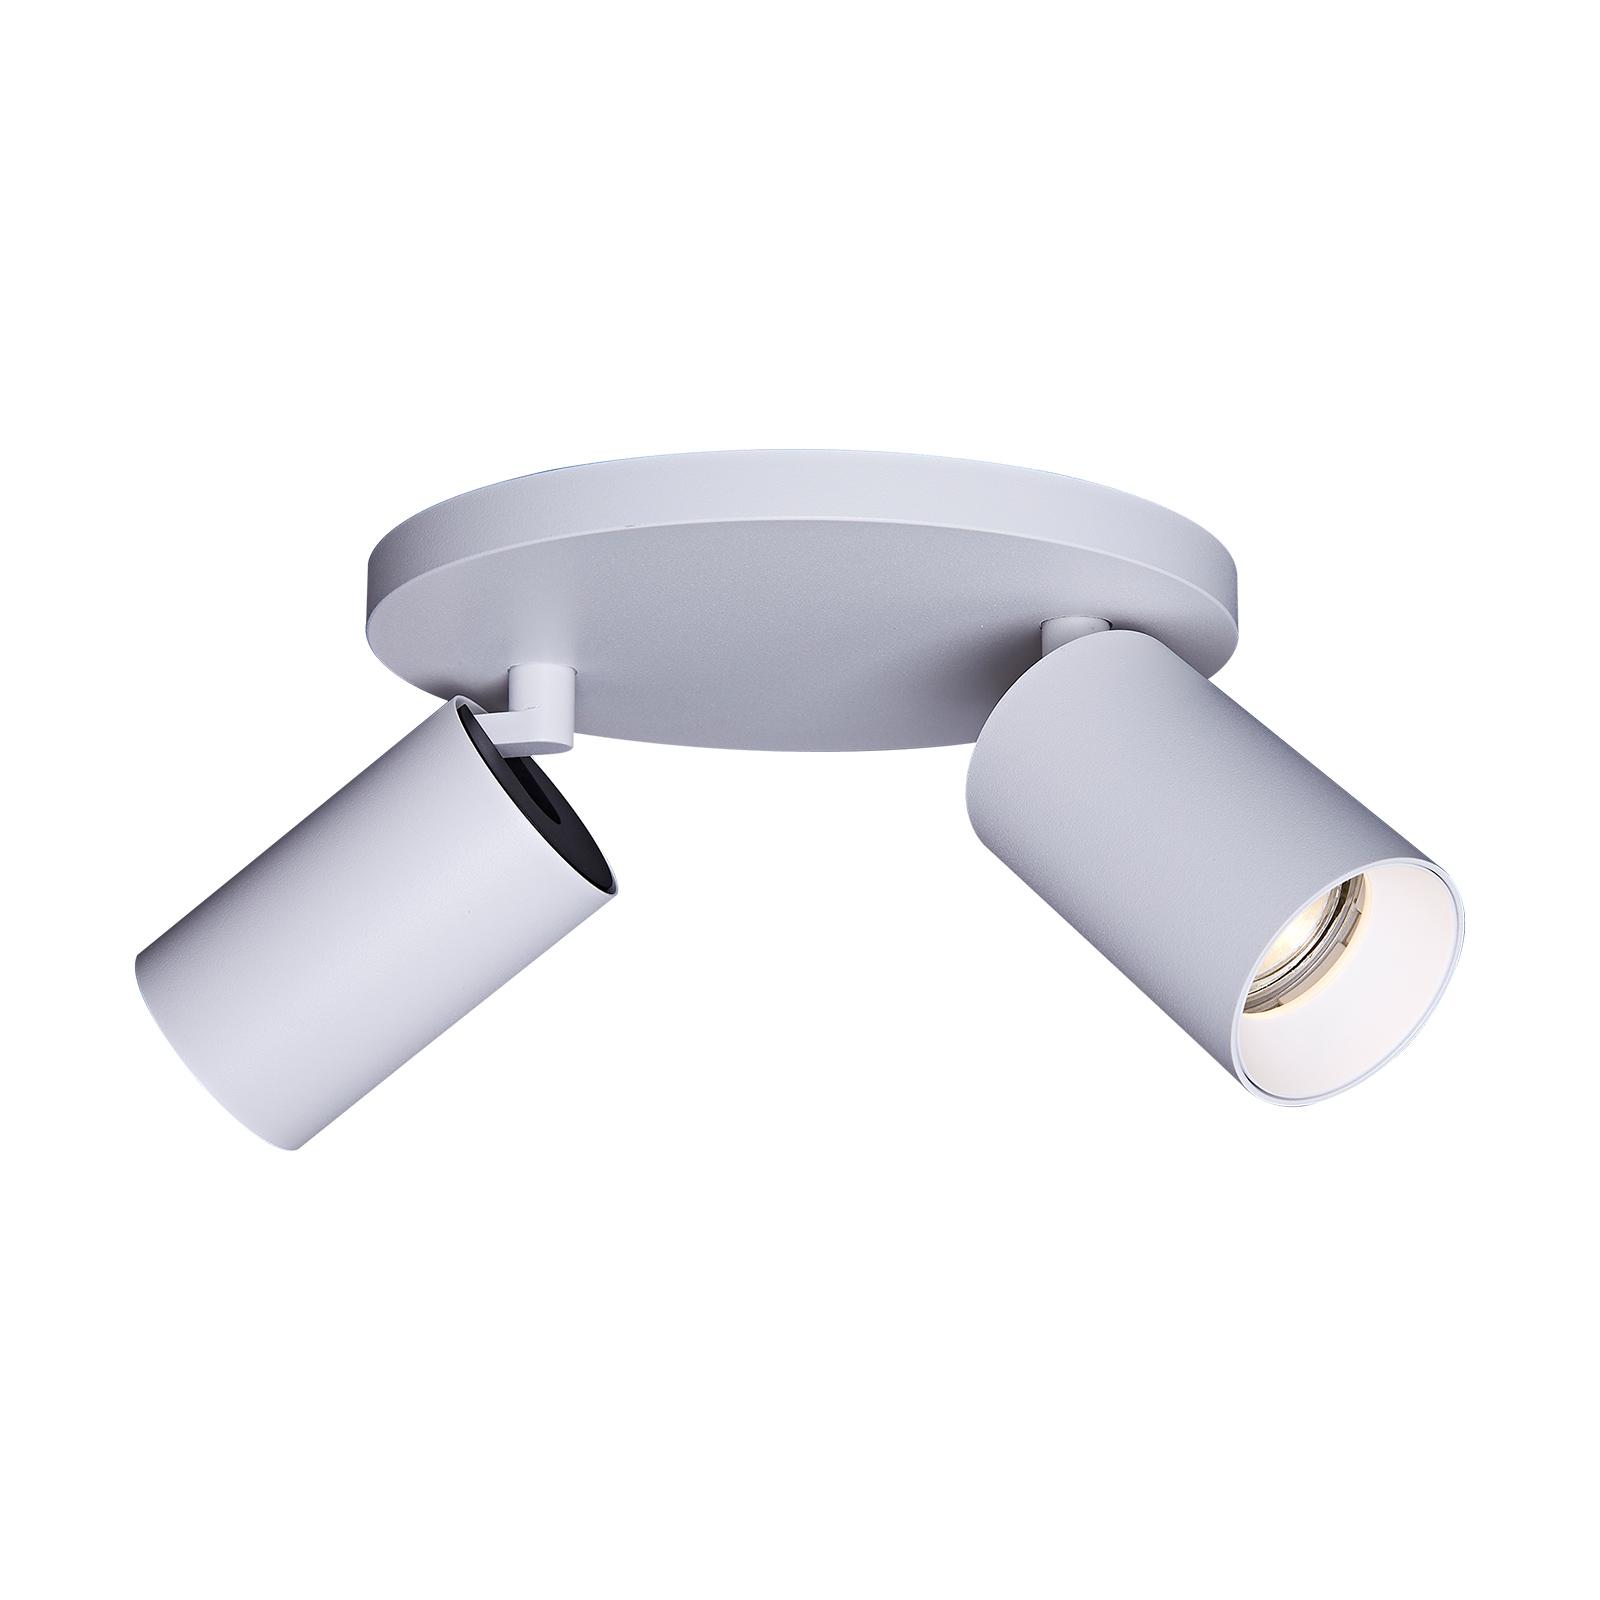 Arcchio Ipega takspotlight, 2 lyskilder, hvit